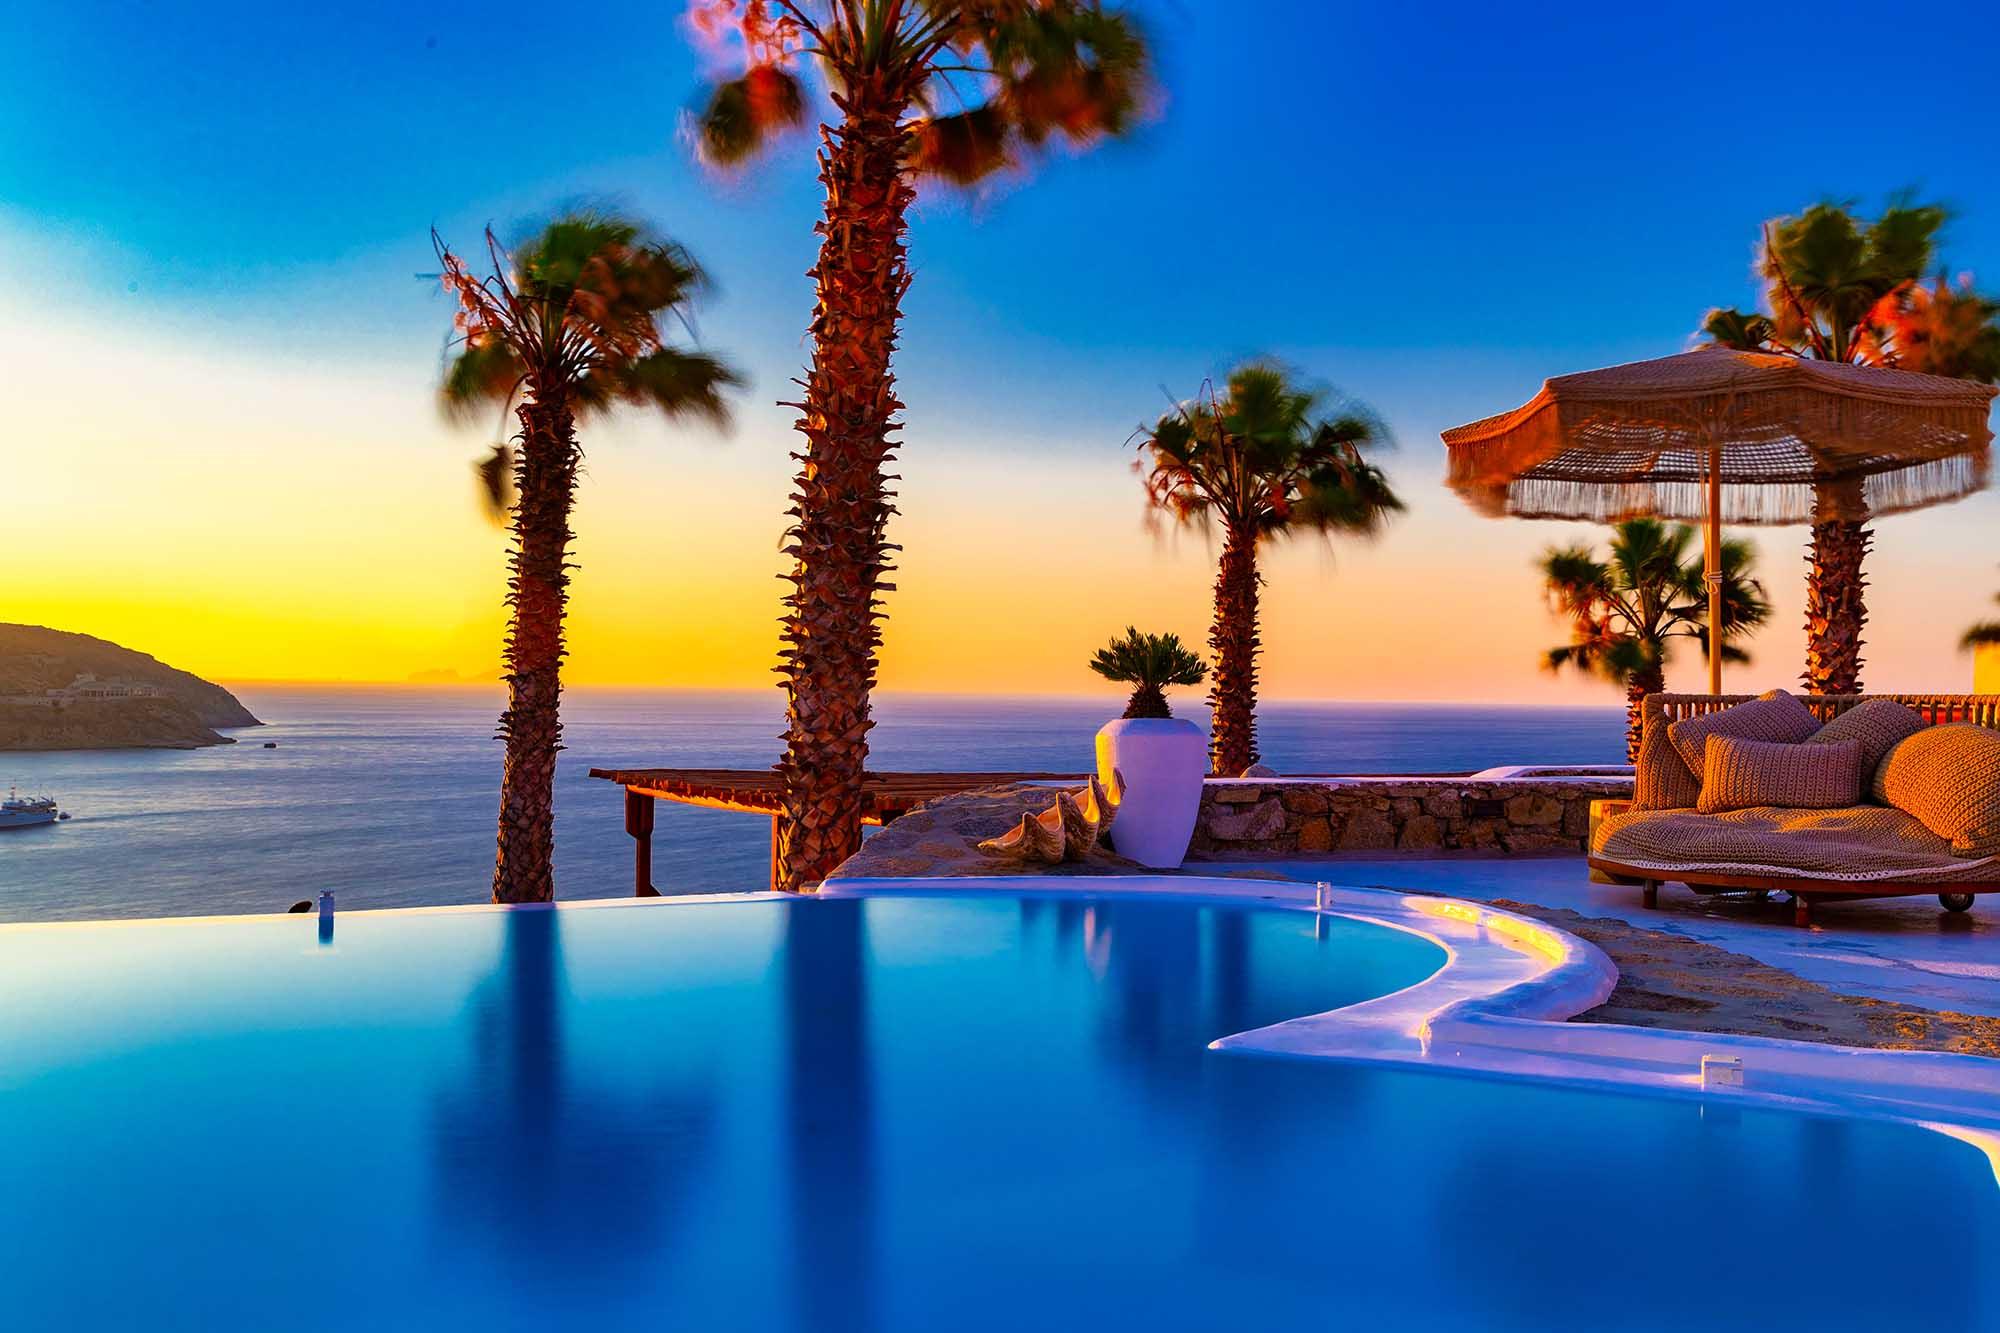 RENT A LUXURIOUS VILLA BY THE SEA IN MYKONOS - VILLA KARKOS - sunset swimming pool